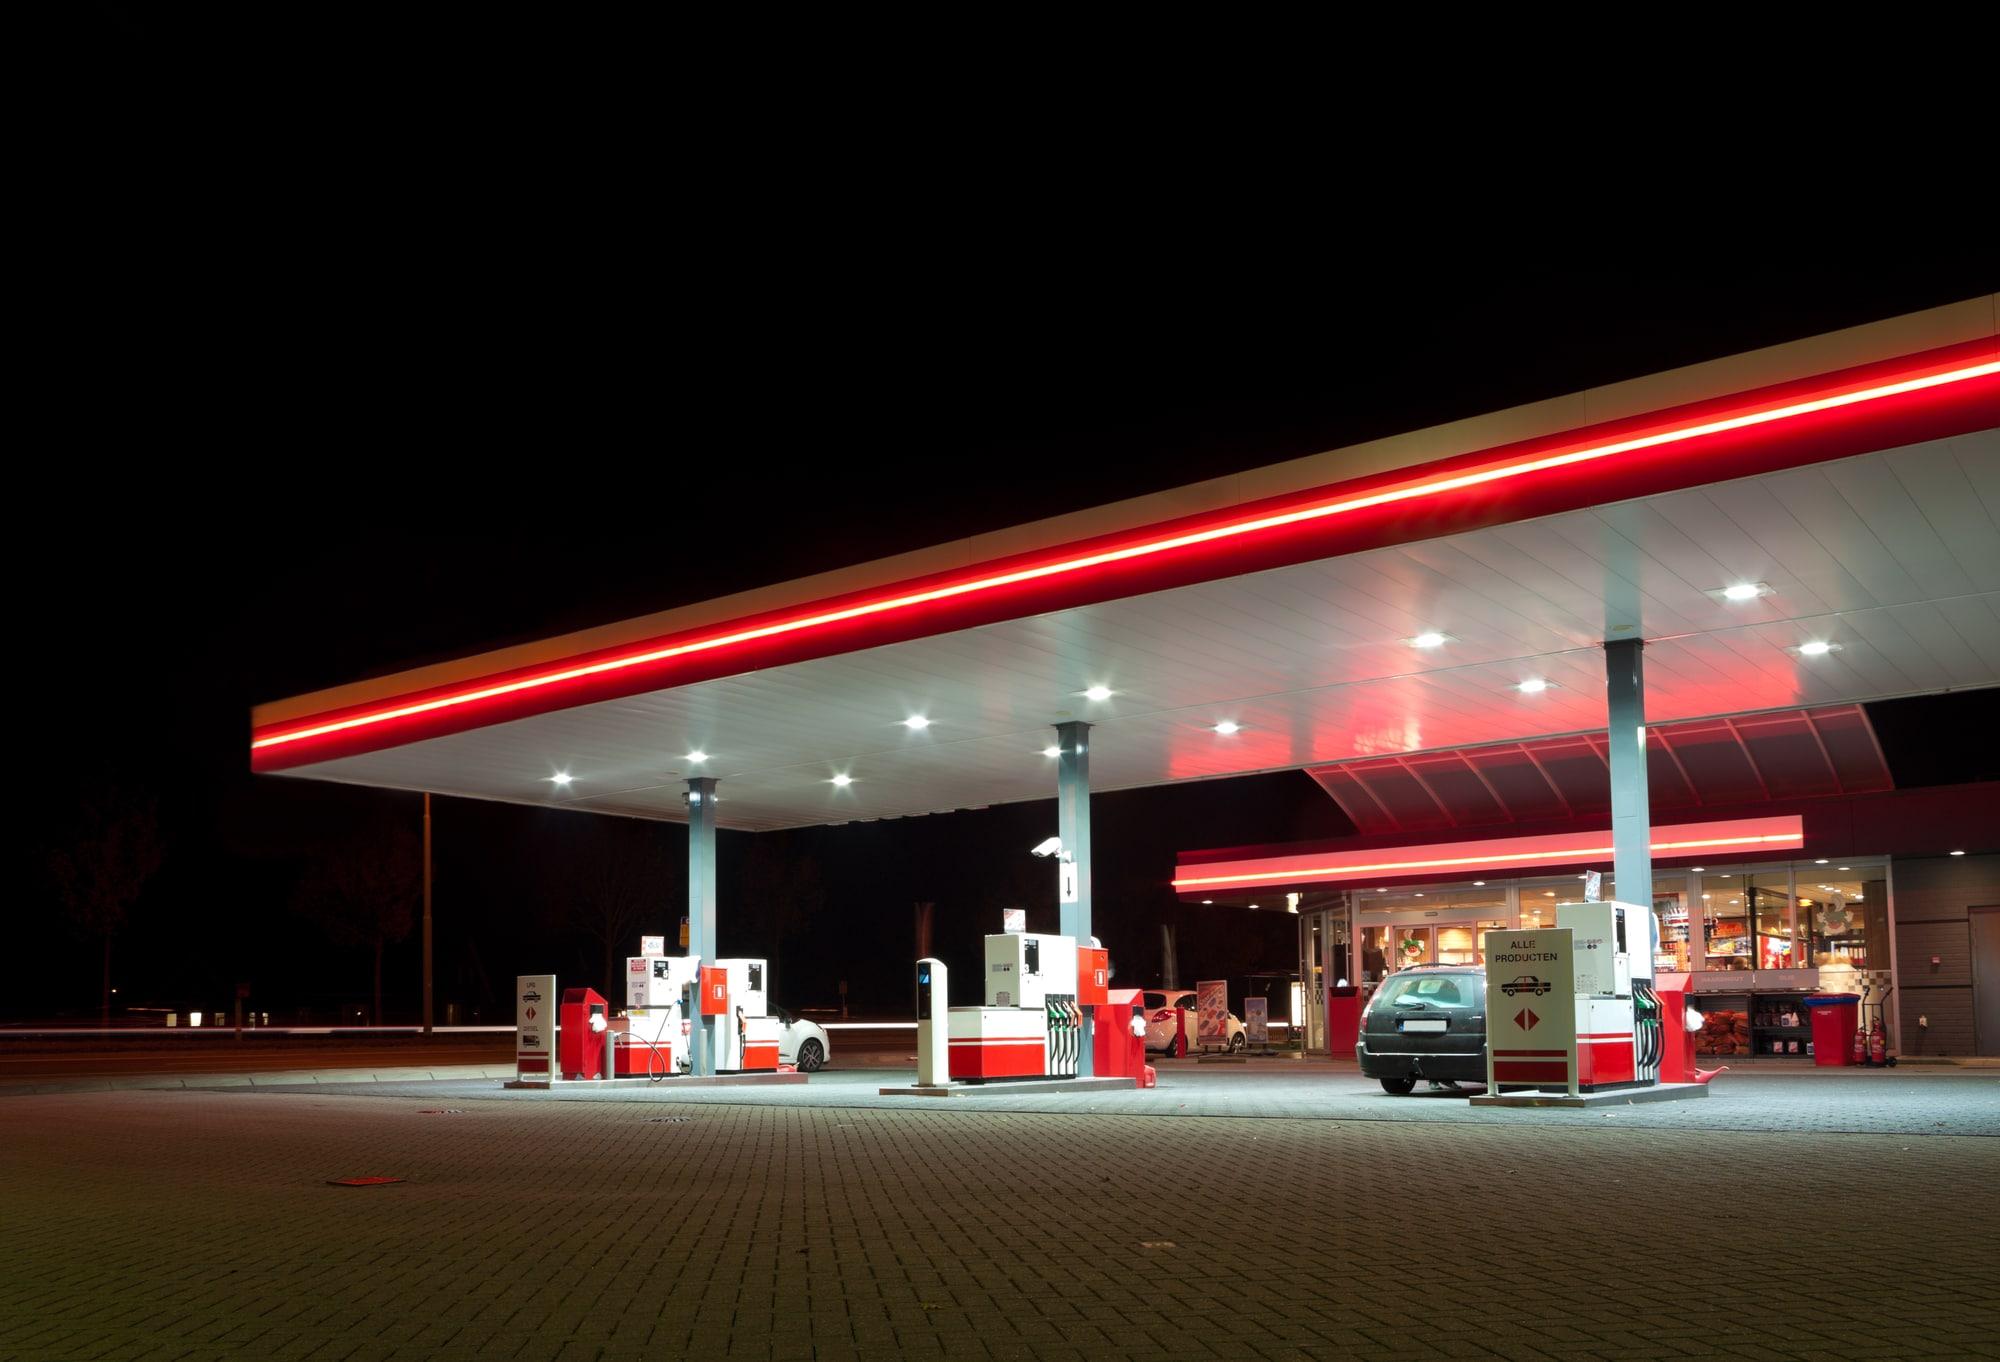 Metano, prezzi alle stelle: superati i 2 euro al kg thumbnail